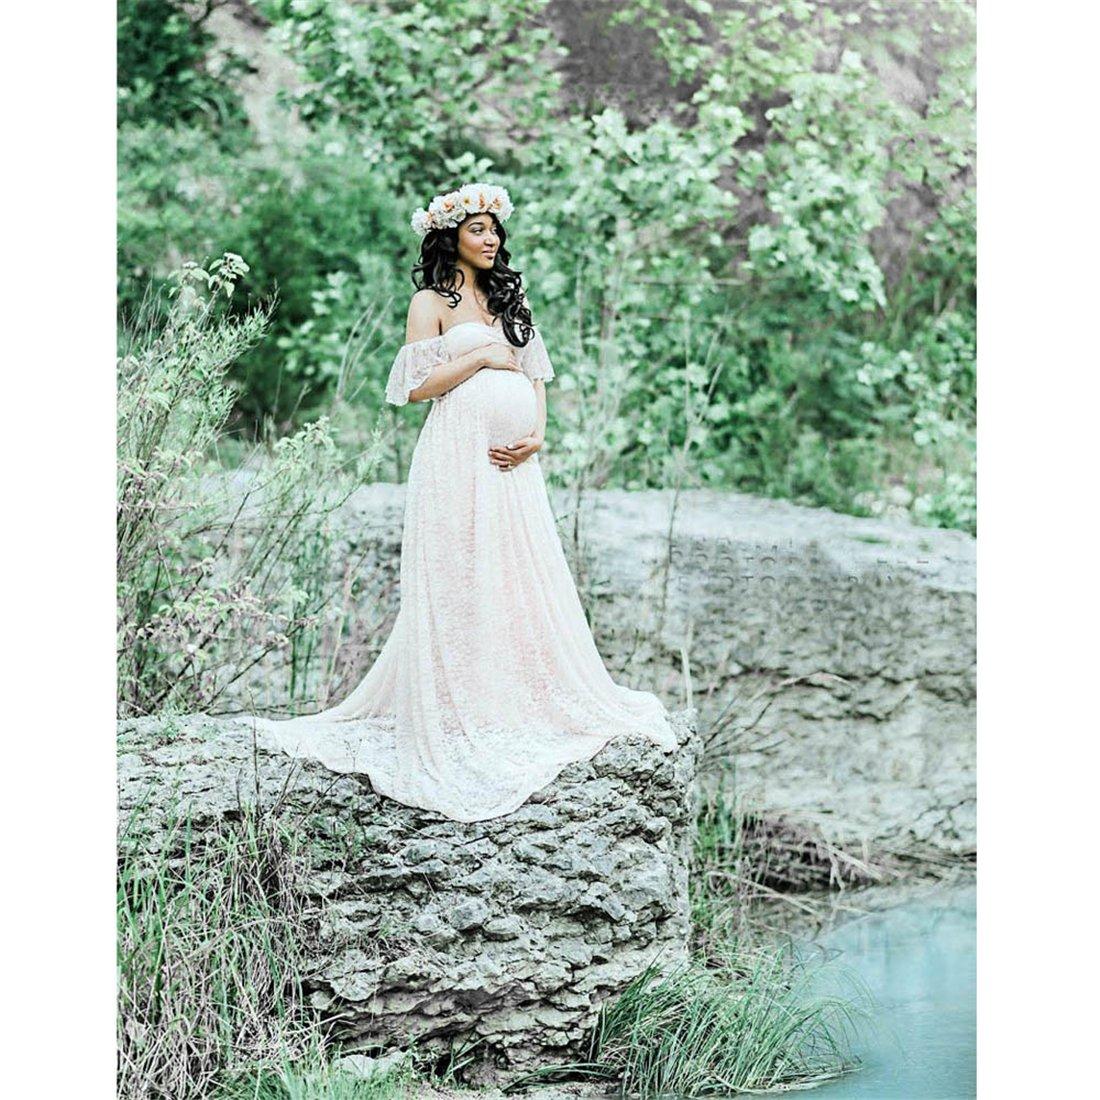 b659e51b3e5c3 Amazon.com: Long Maternity Dress,Hemlock Women Lace Maternity Photo Dress  Off Shoulder Photography Pregnancy Dress (M, White): Computers & Accessories